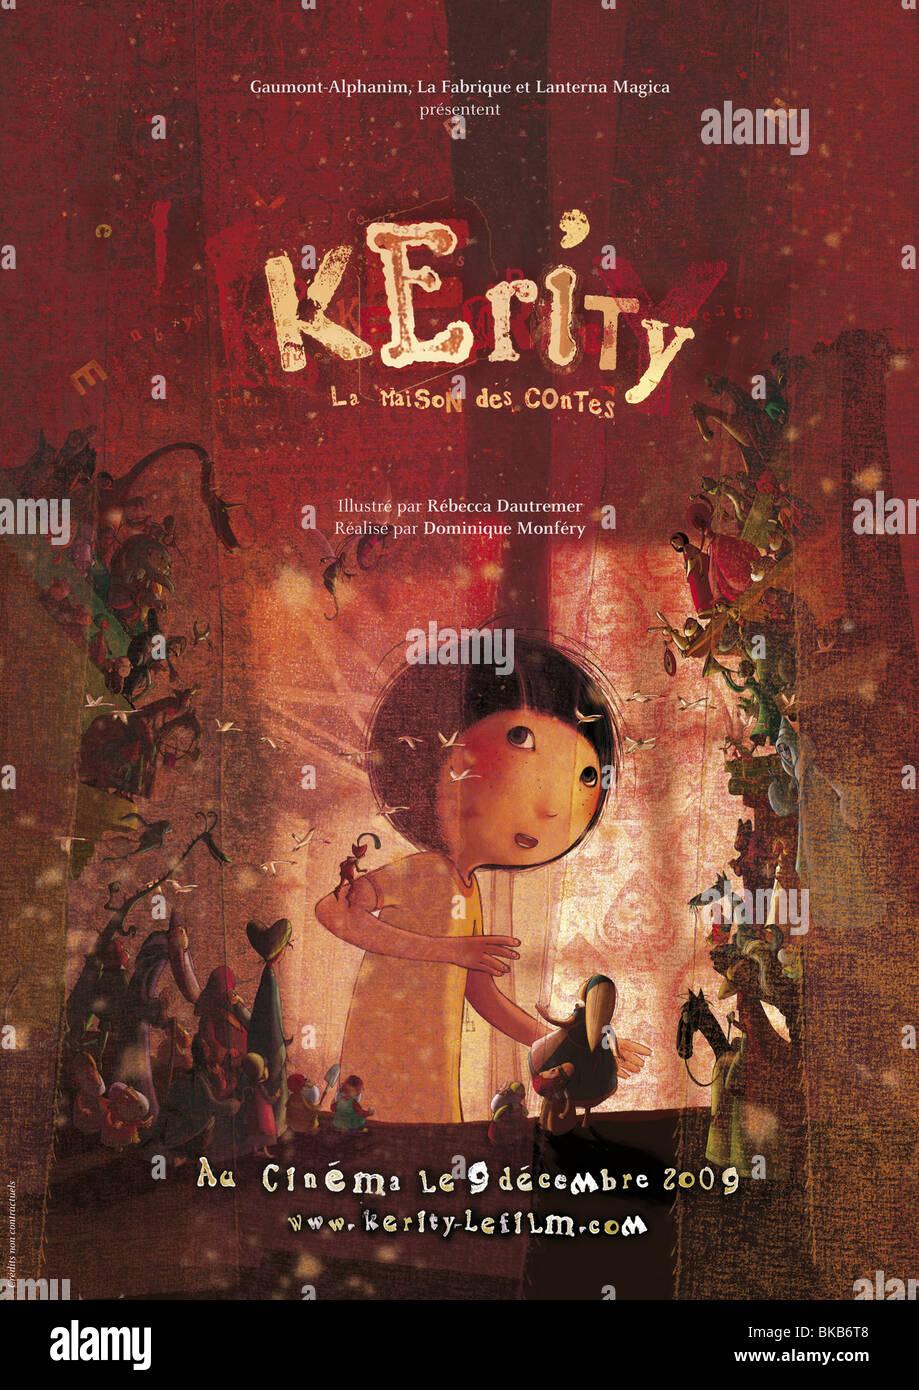 Kerity La Maison Des Contes Year  Director Dominique Monfery Animation Movie Poster Fr